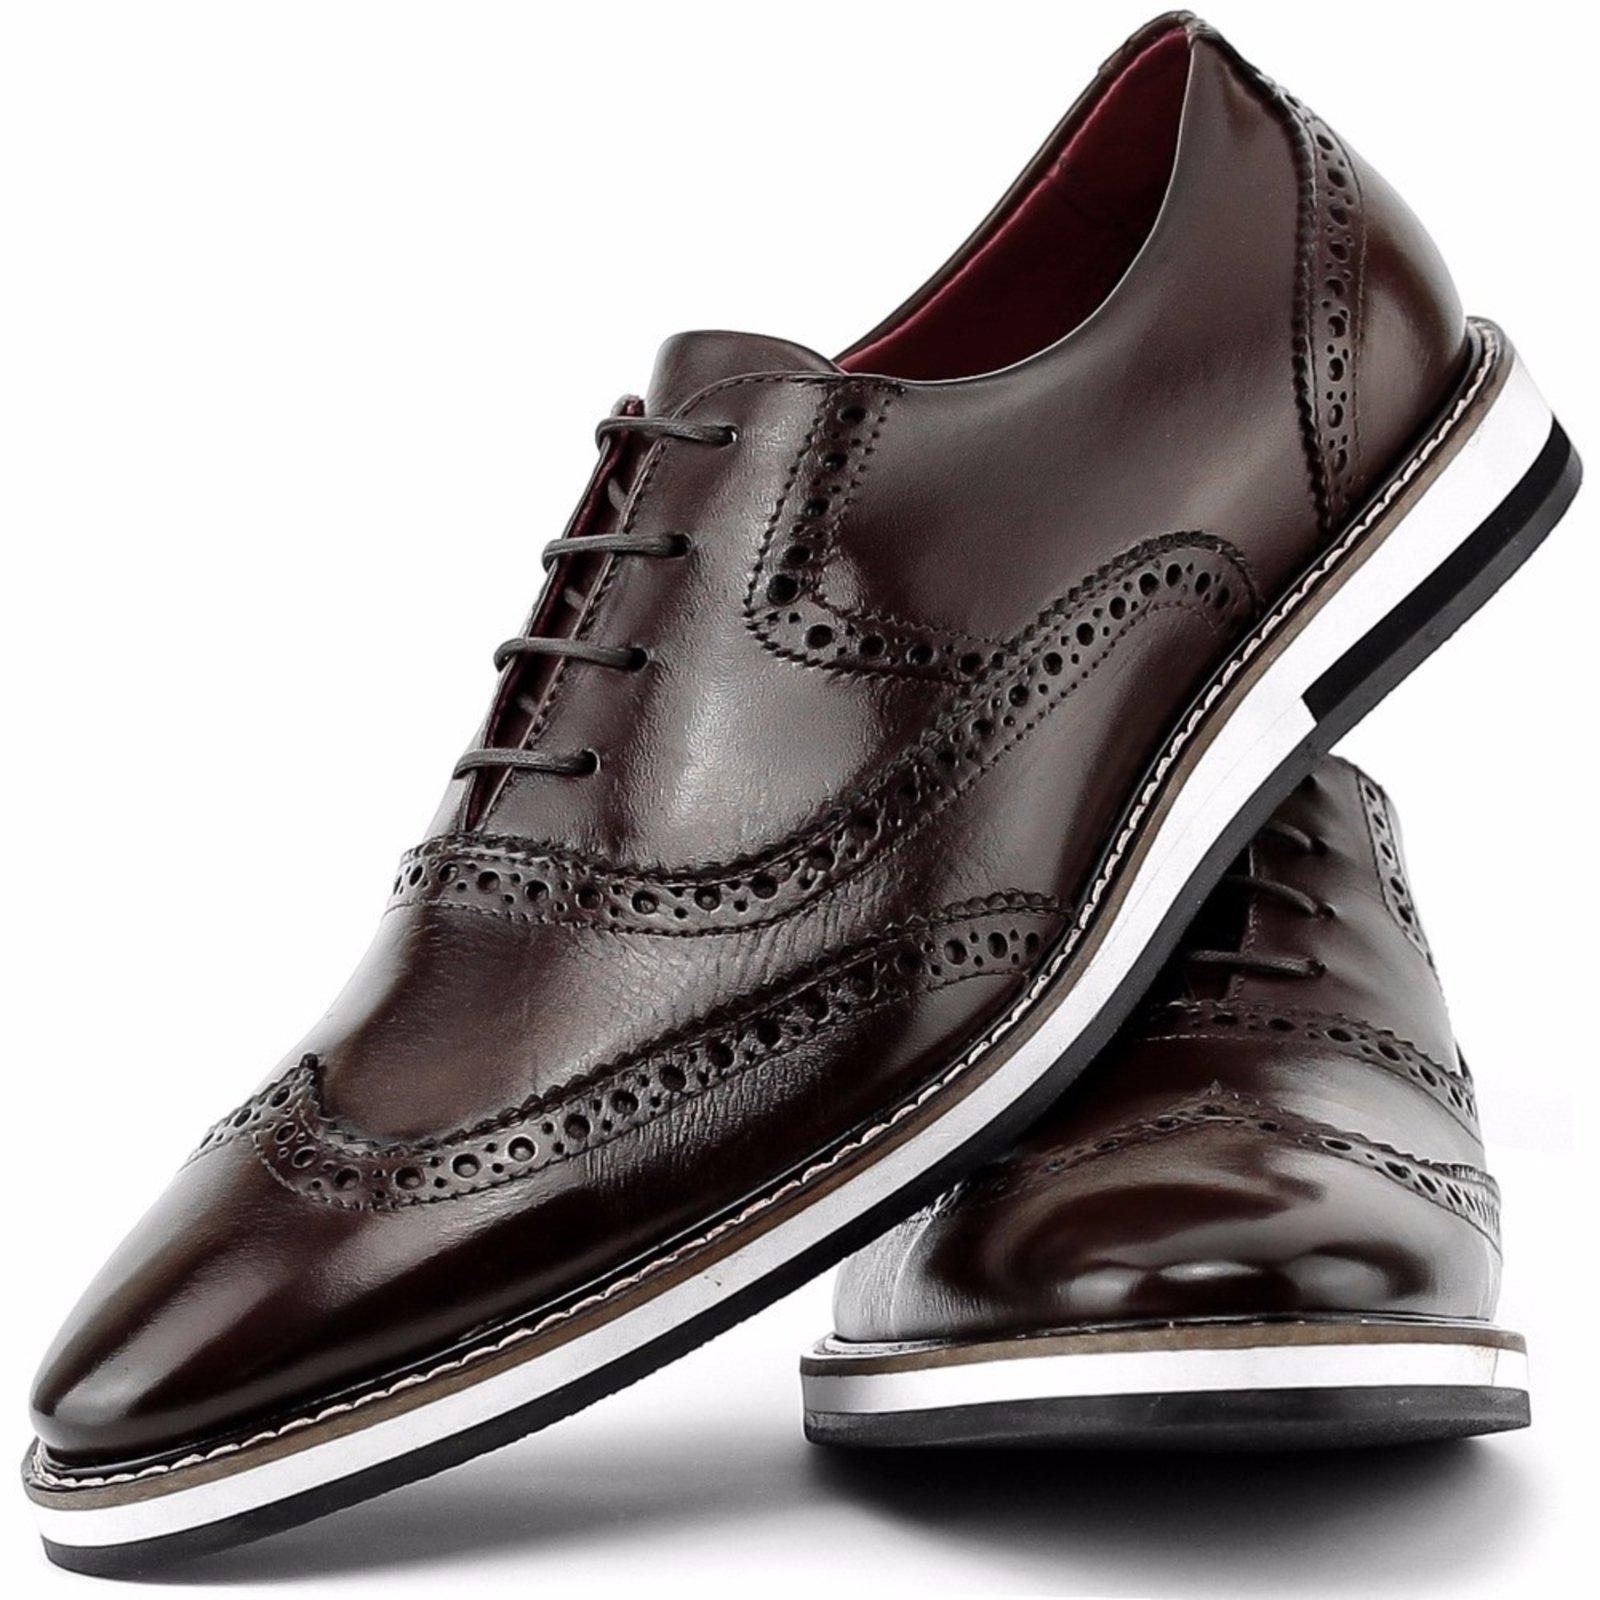 5d60038b6 Sapato ideal para traje esporte fino - Blog Kanui